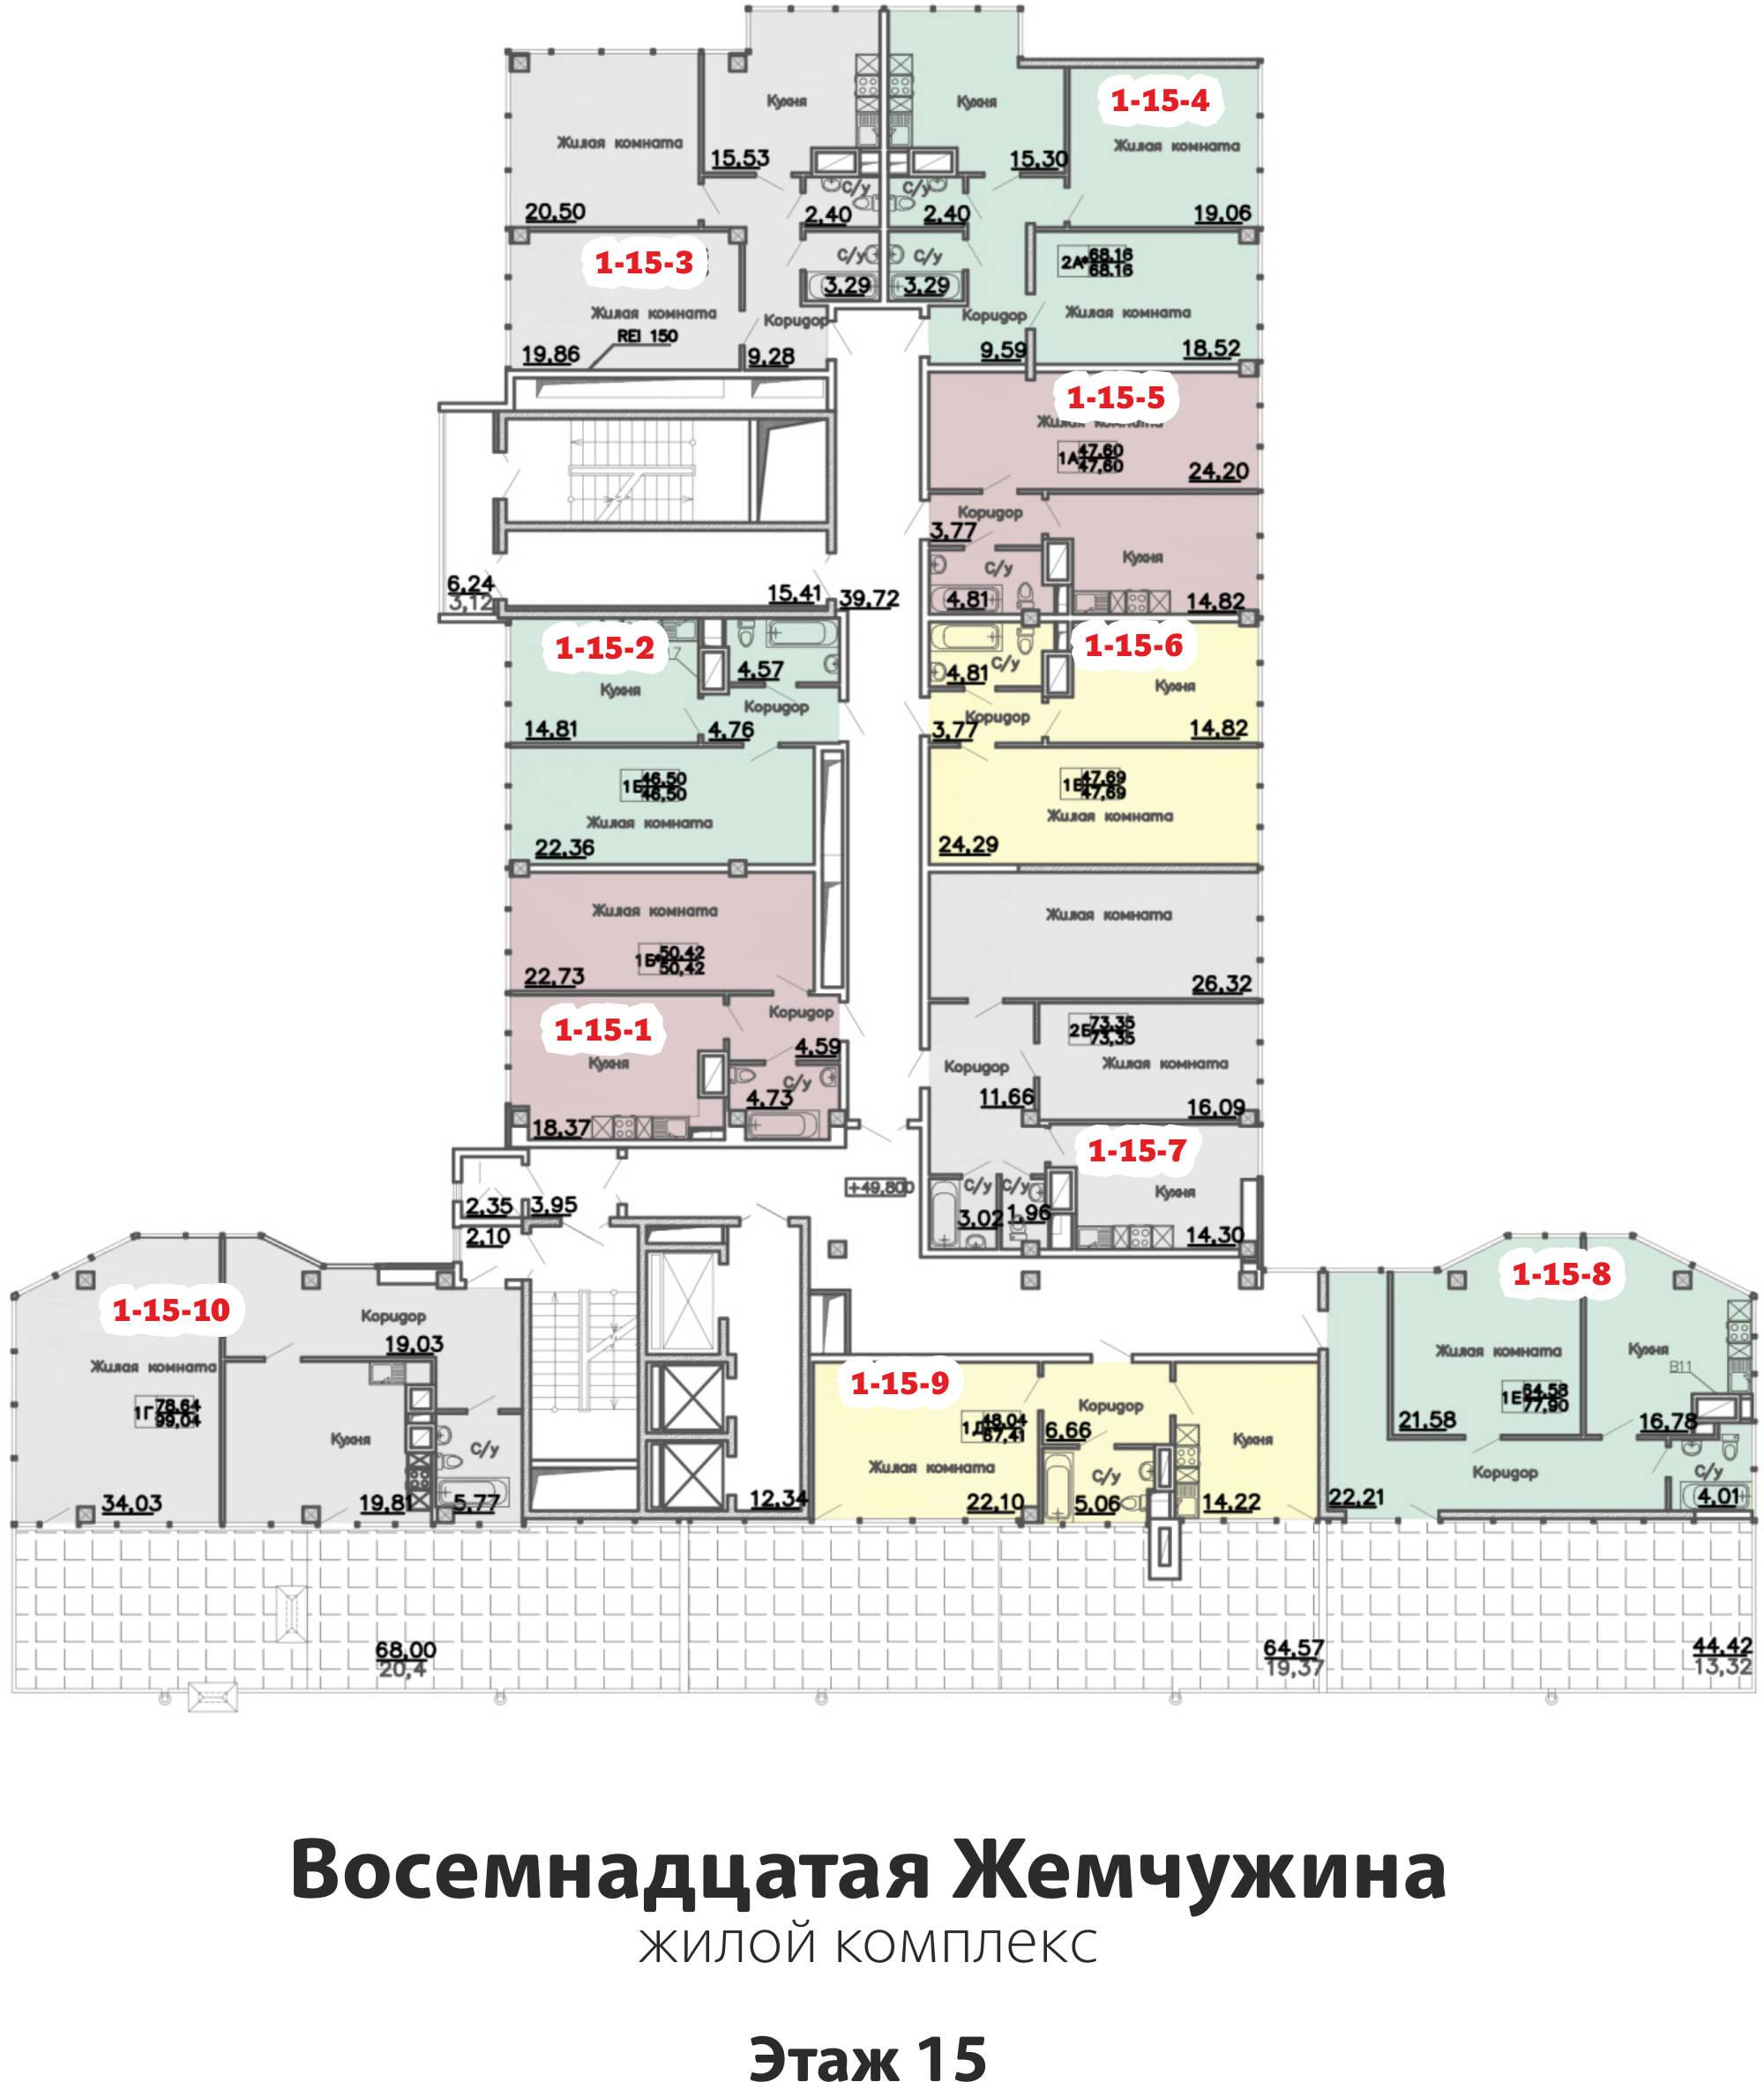 Кадорр, 18 Жемчужина, Планировка этаж 15